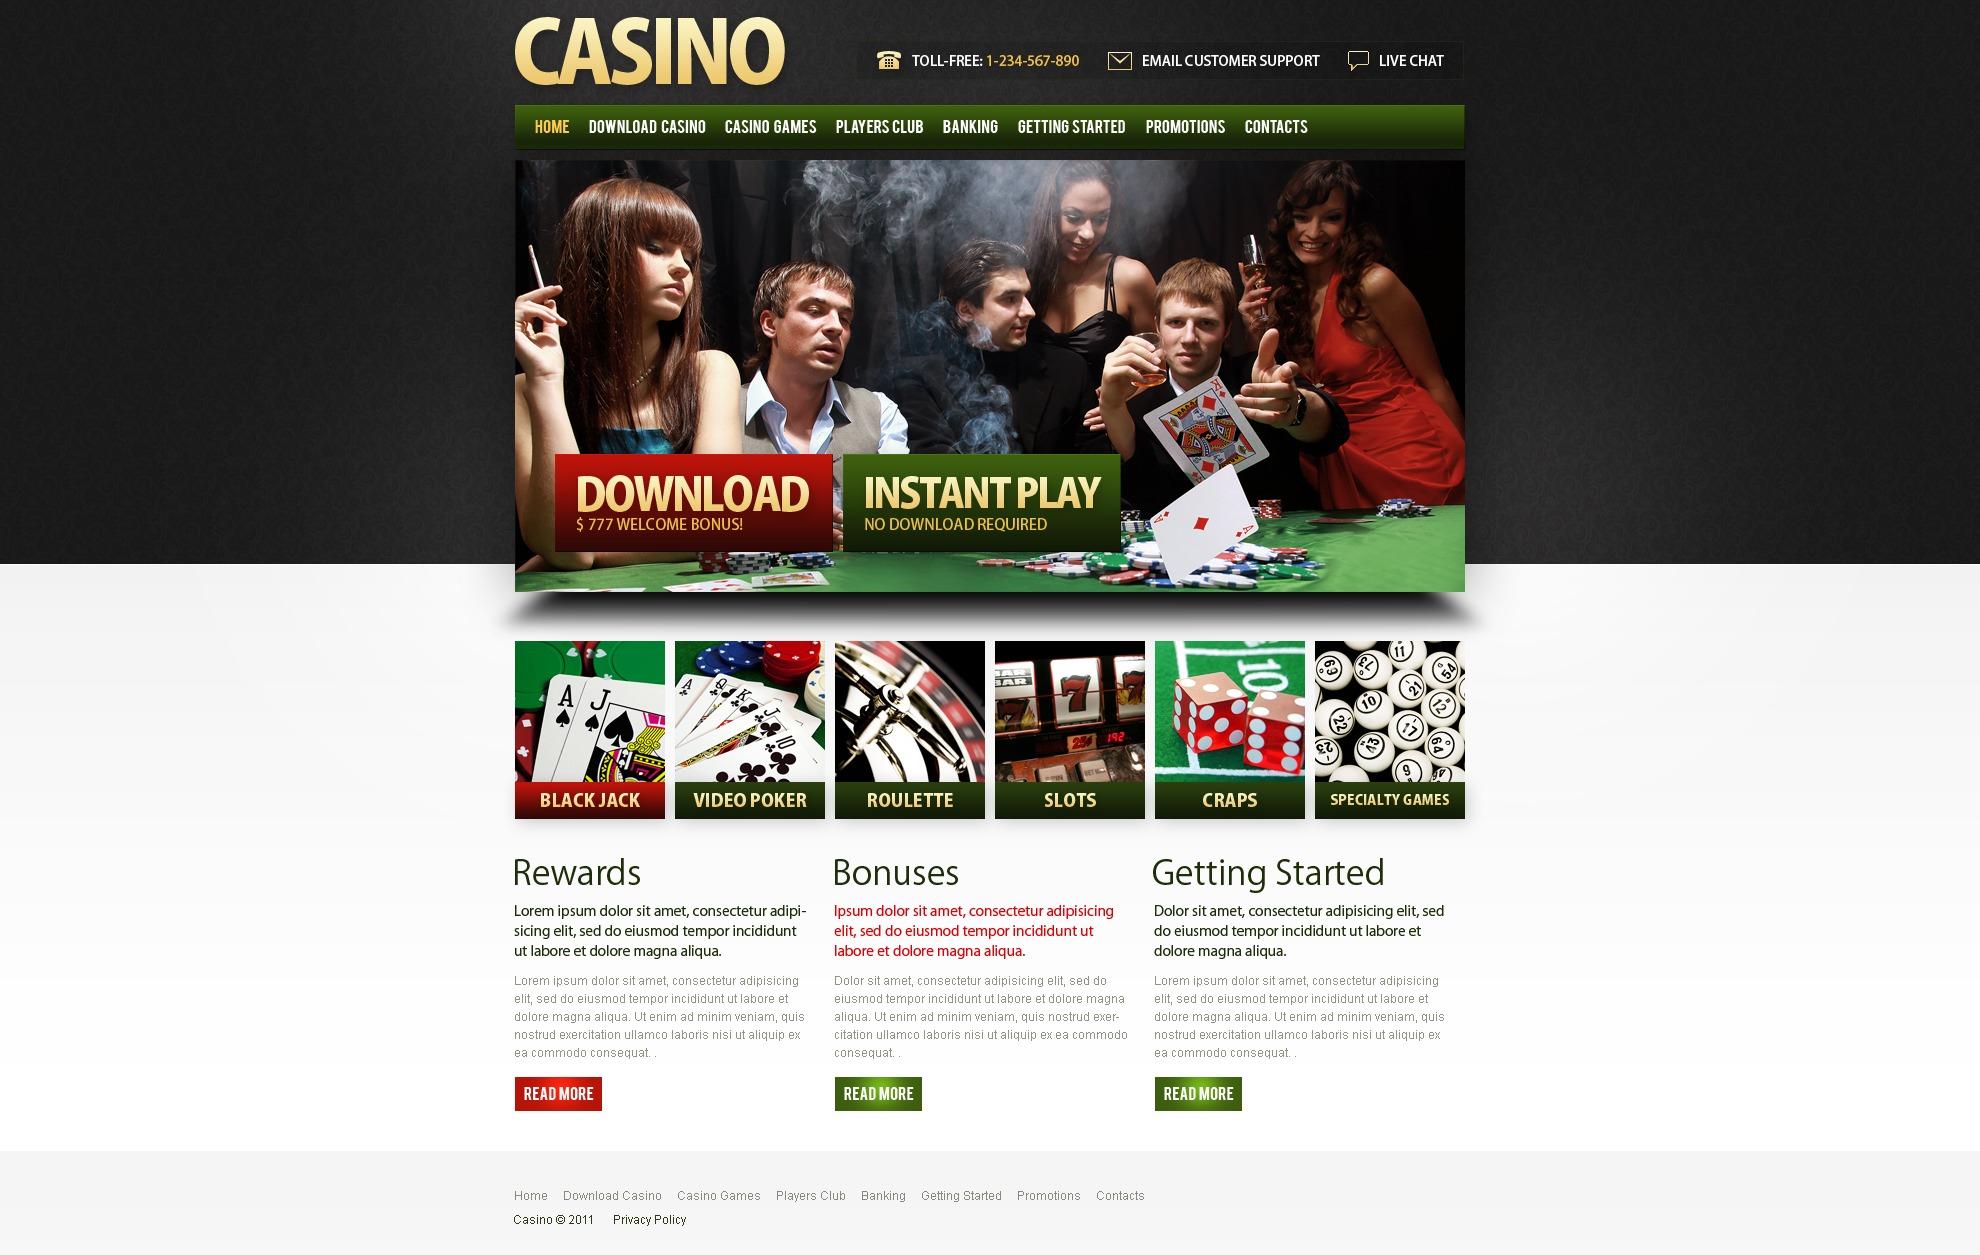 Business casino site web cafe casino florida hard hollywood rock